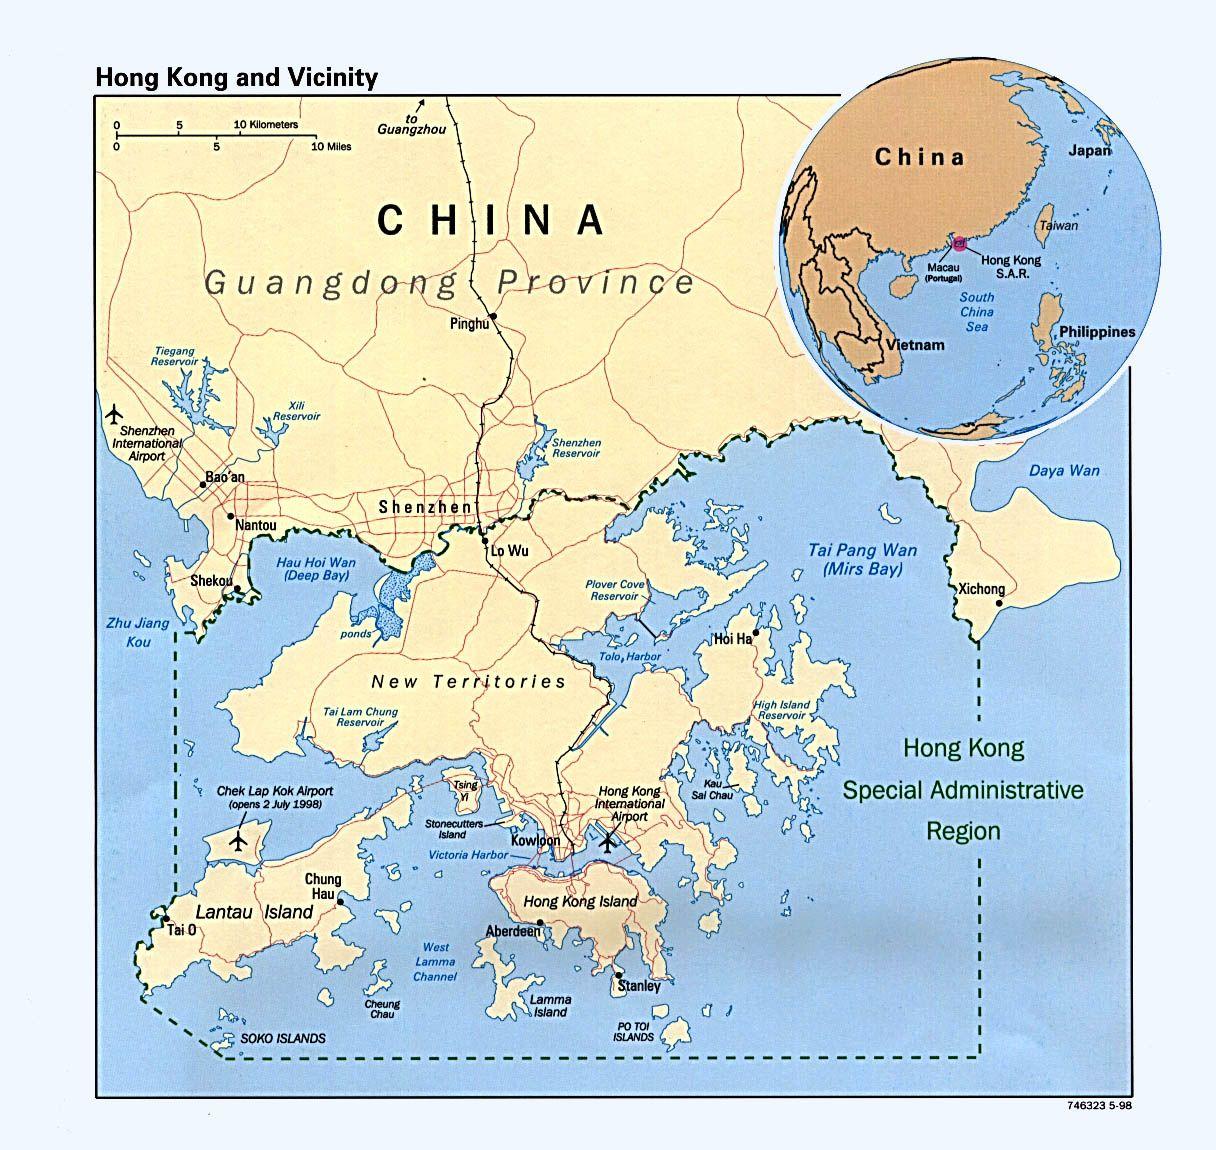 Hong Kong Academy for Gifted Education: An In-Depth ysis ... Kowloon Hong Kong China World Map on yunnan china, fujian china, hangzhou china, macau china, beijing china, singapore china, new territories china,